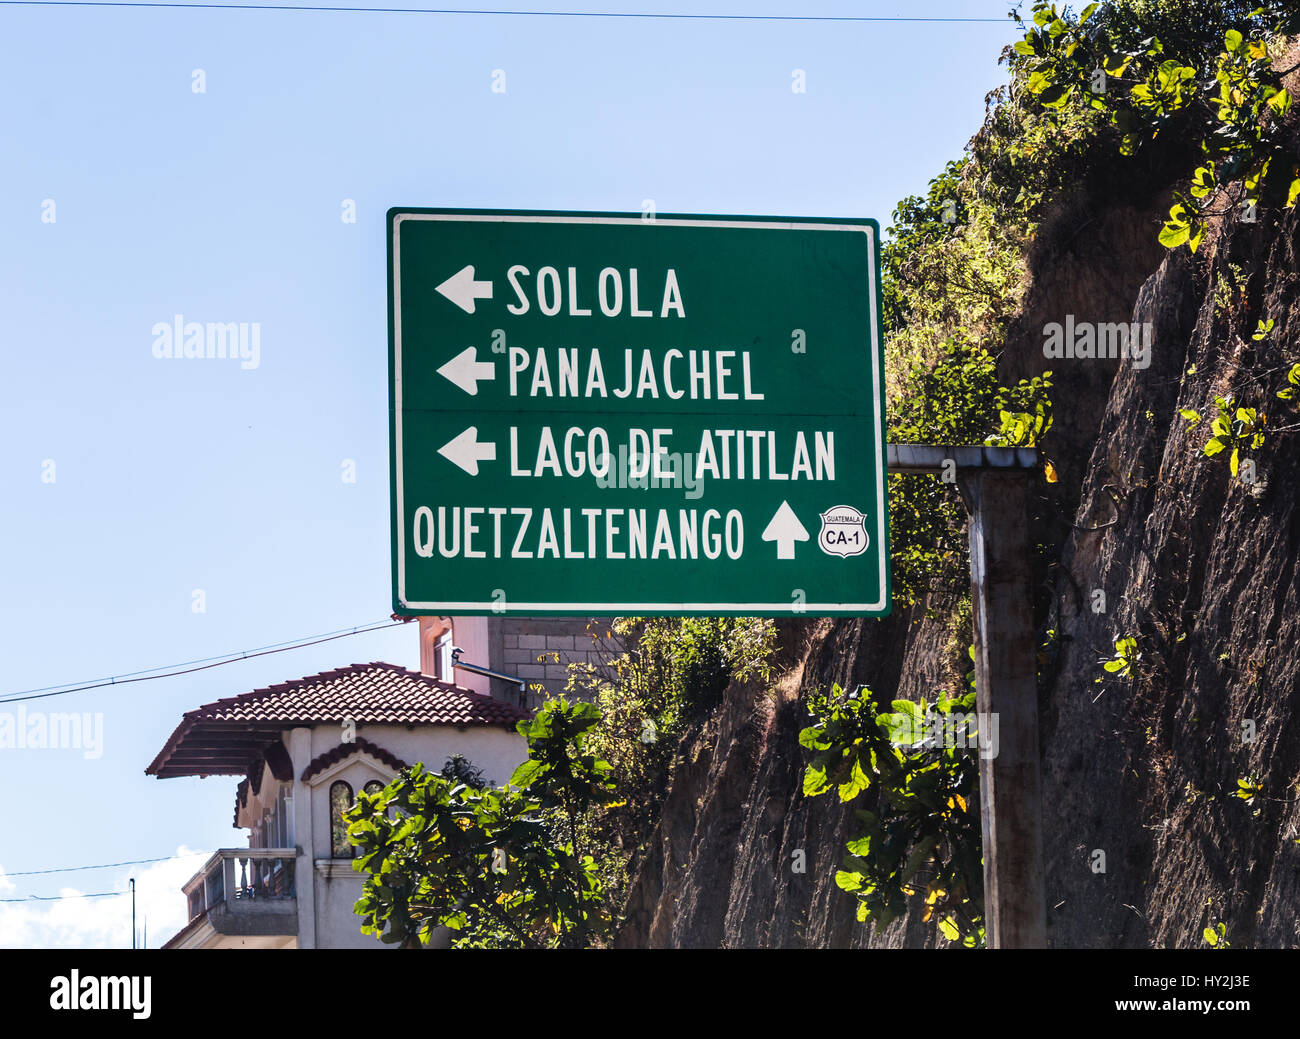 Guatemala road sign with Solola, Panajachel, Lago de Atitlan, and Quetzaltenango. - Stock Image